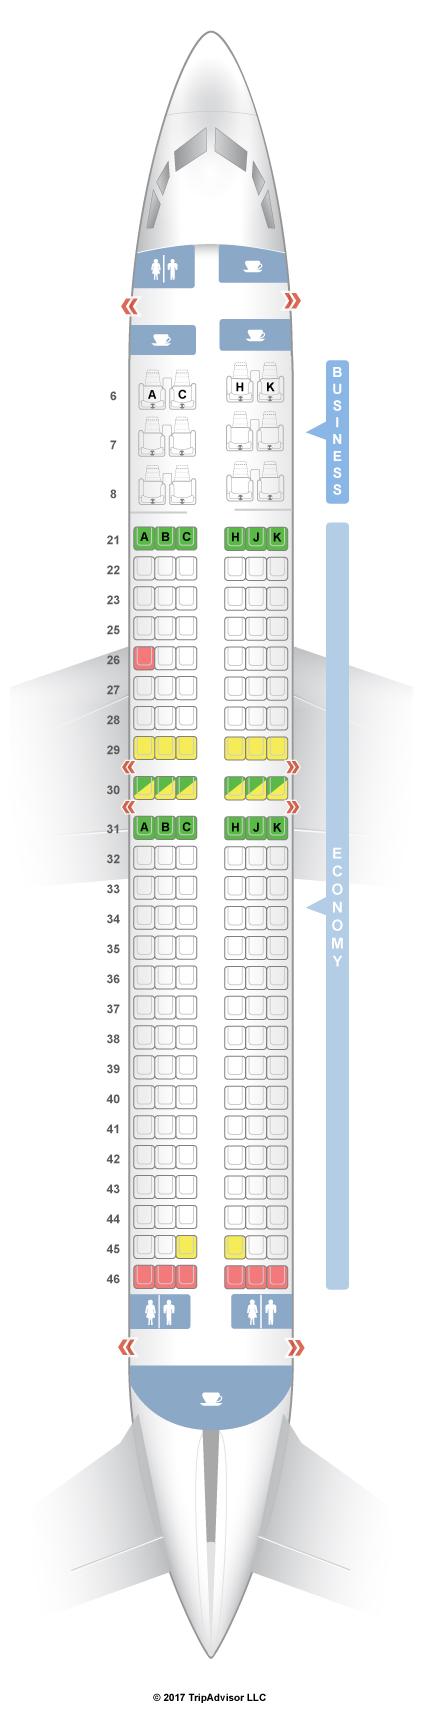 Seatguru Seat Map Garuda Indonesia Boeing 737 800 738